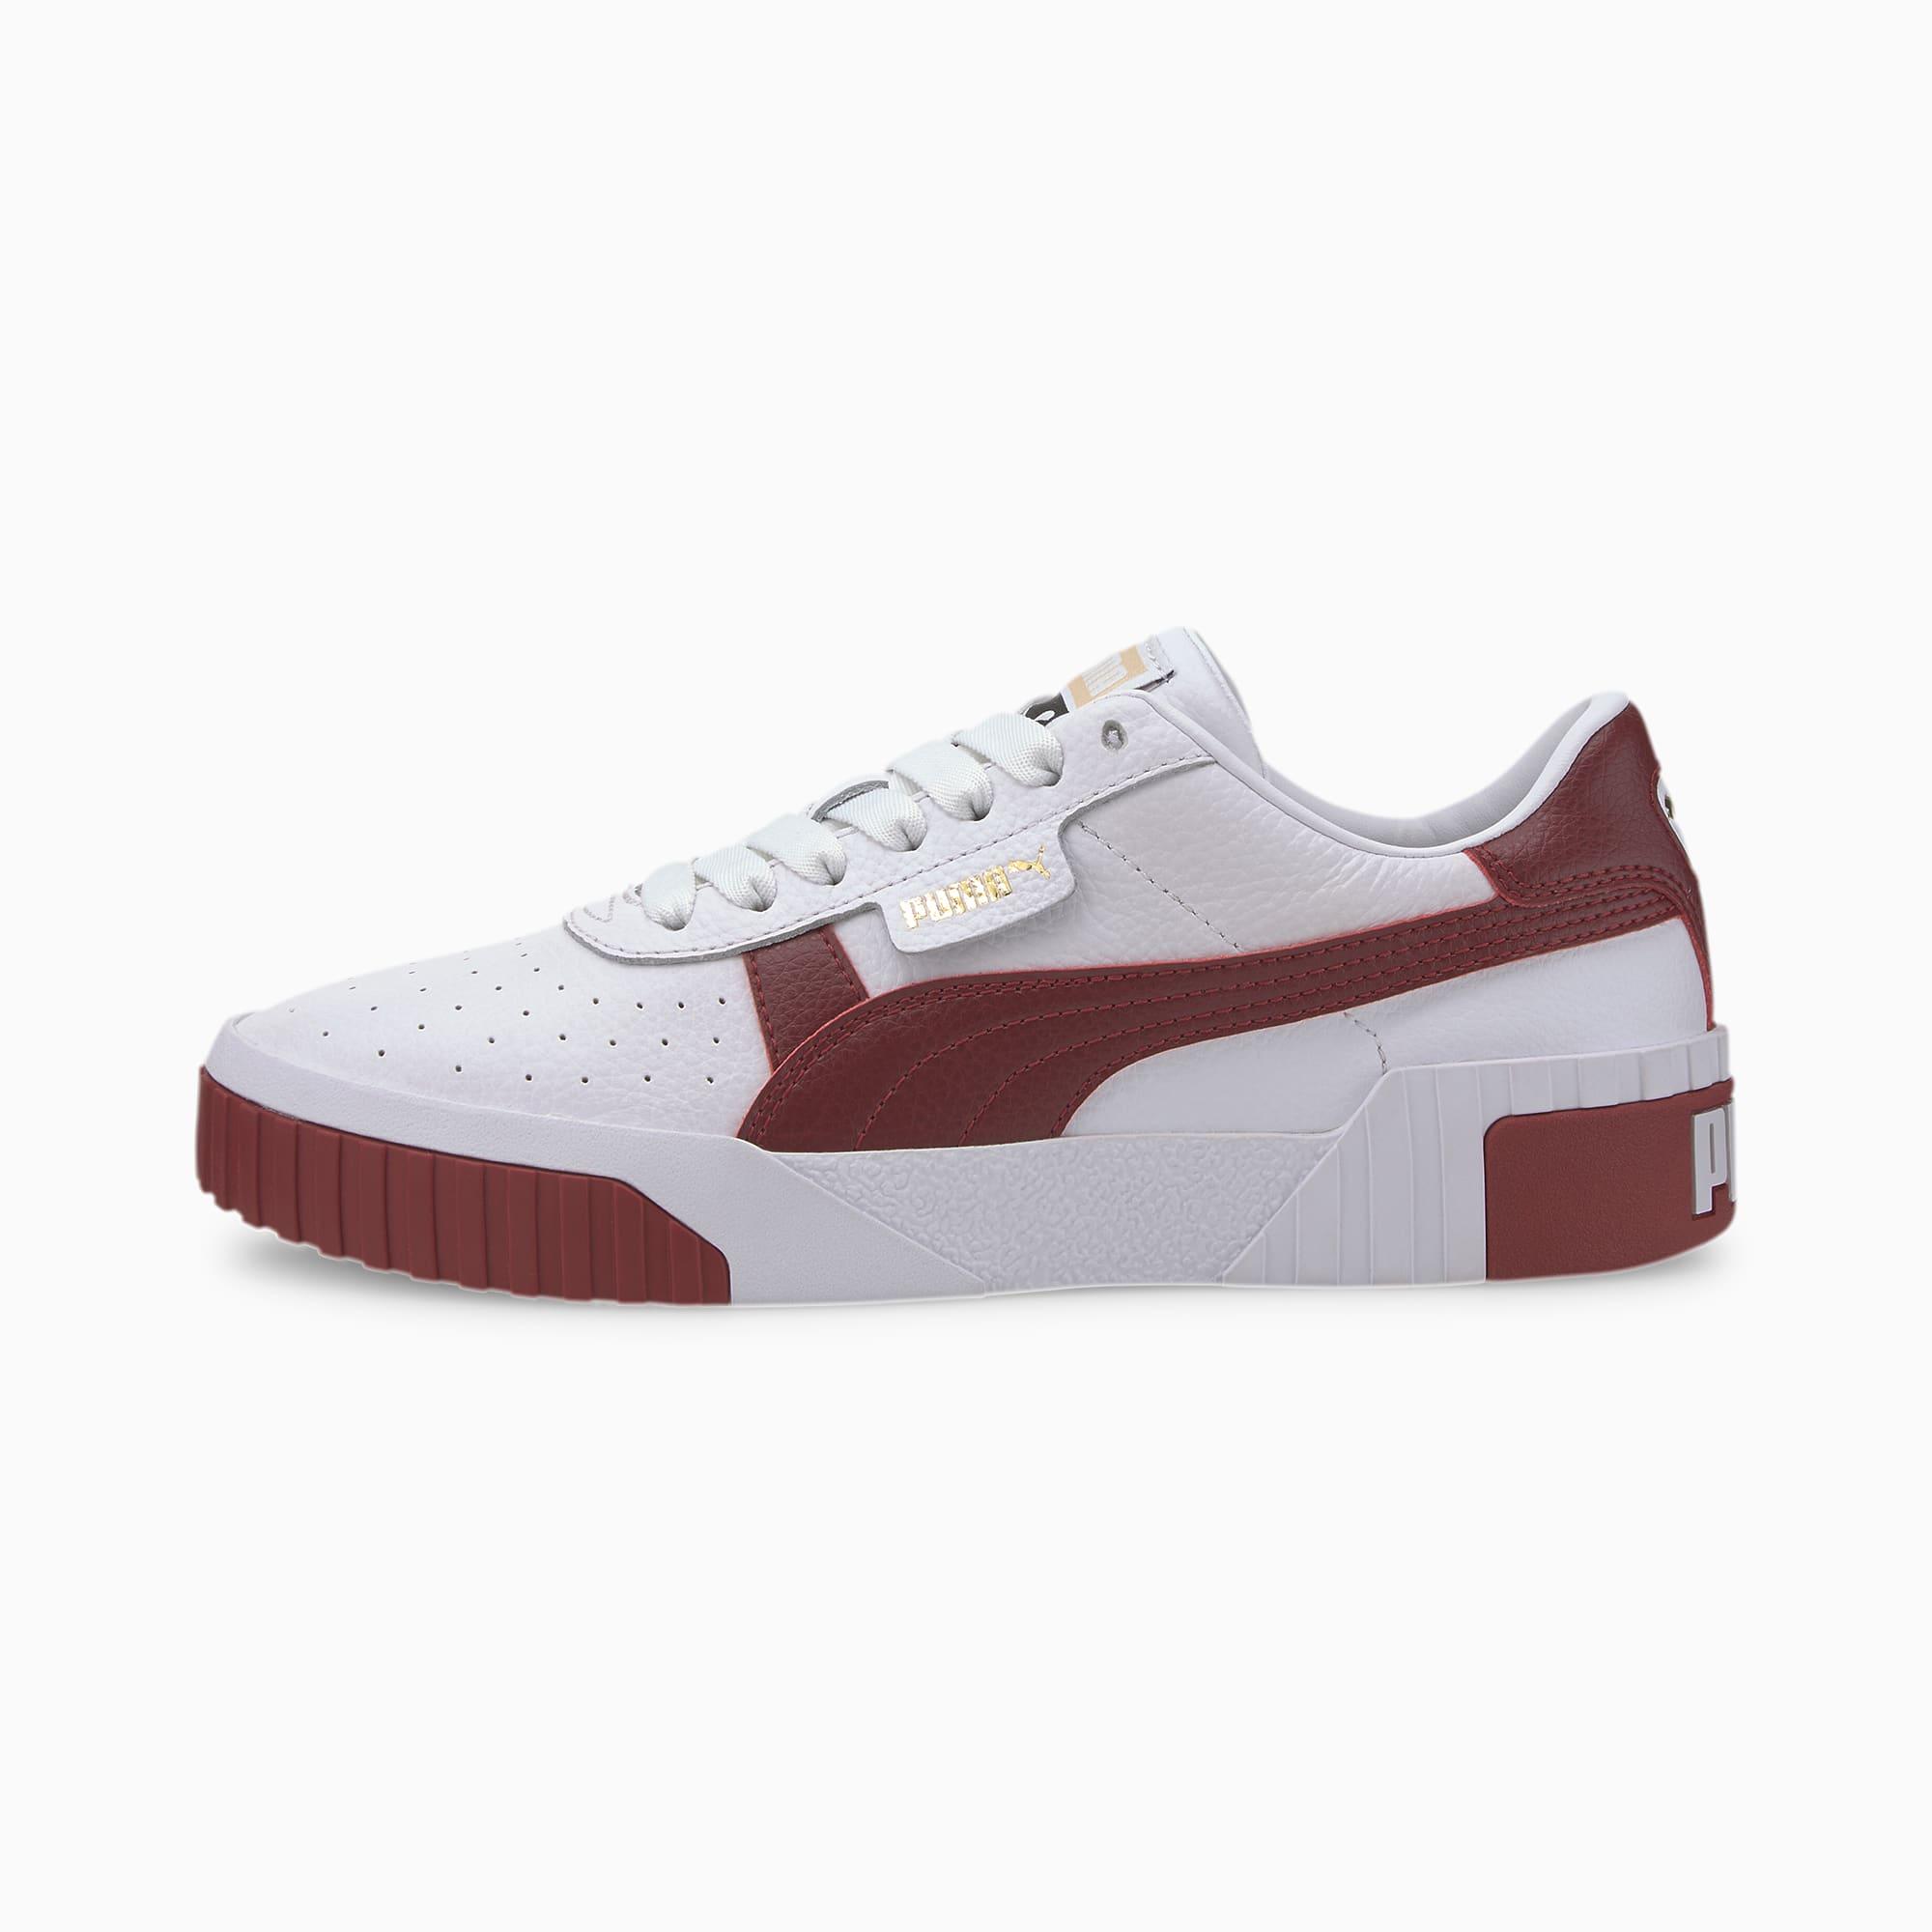 Image of PUMA Cali Damen Sneaker Schuhe   Mit Aucun   Weiß   Größe: 35.5